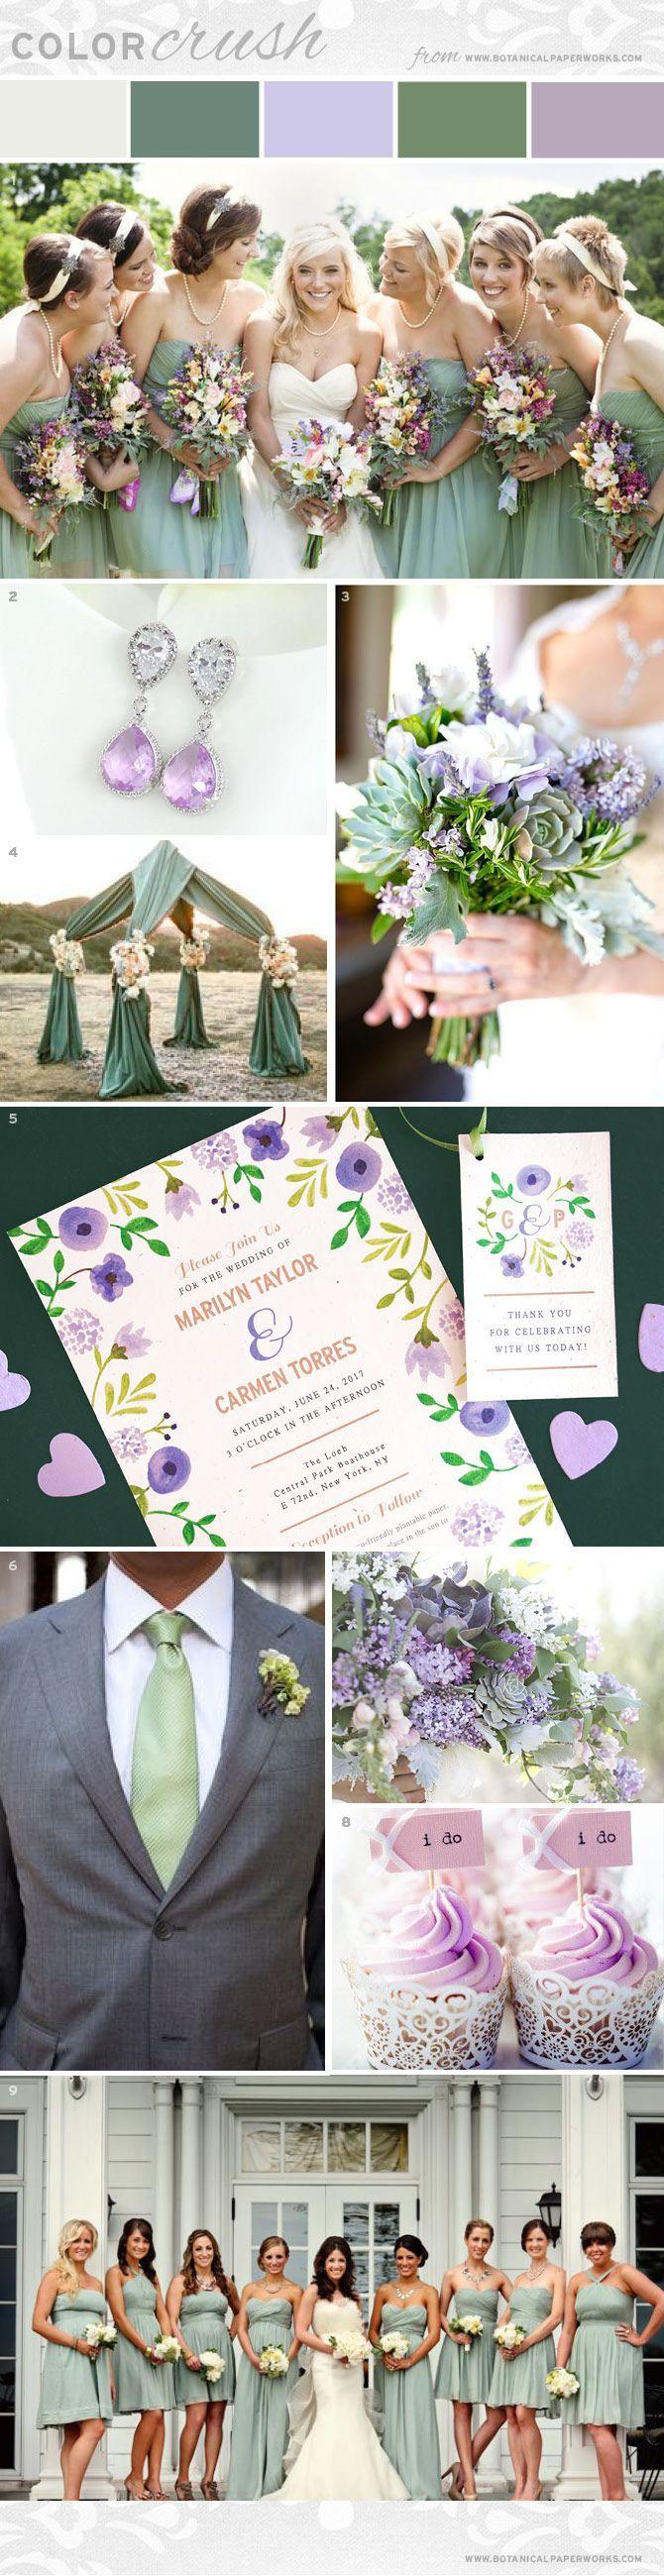 1134 best Wedding (someday) images on Pinterest | Weddings, Dream ...